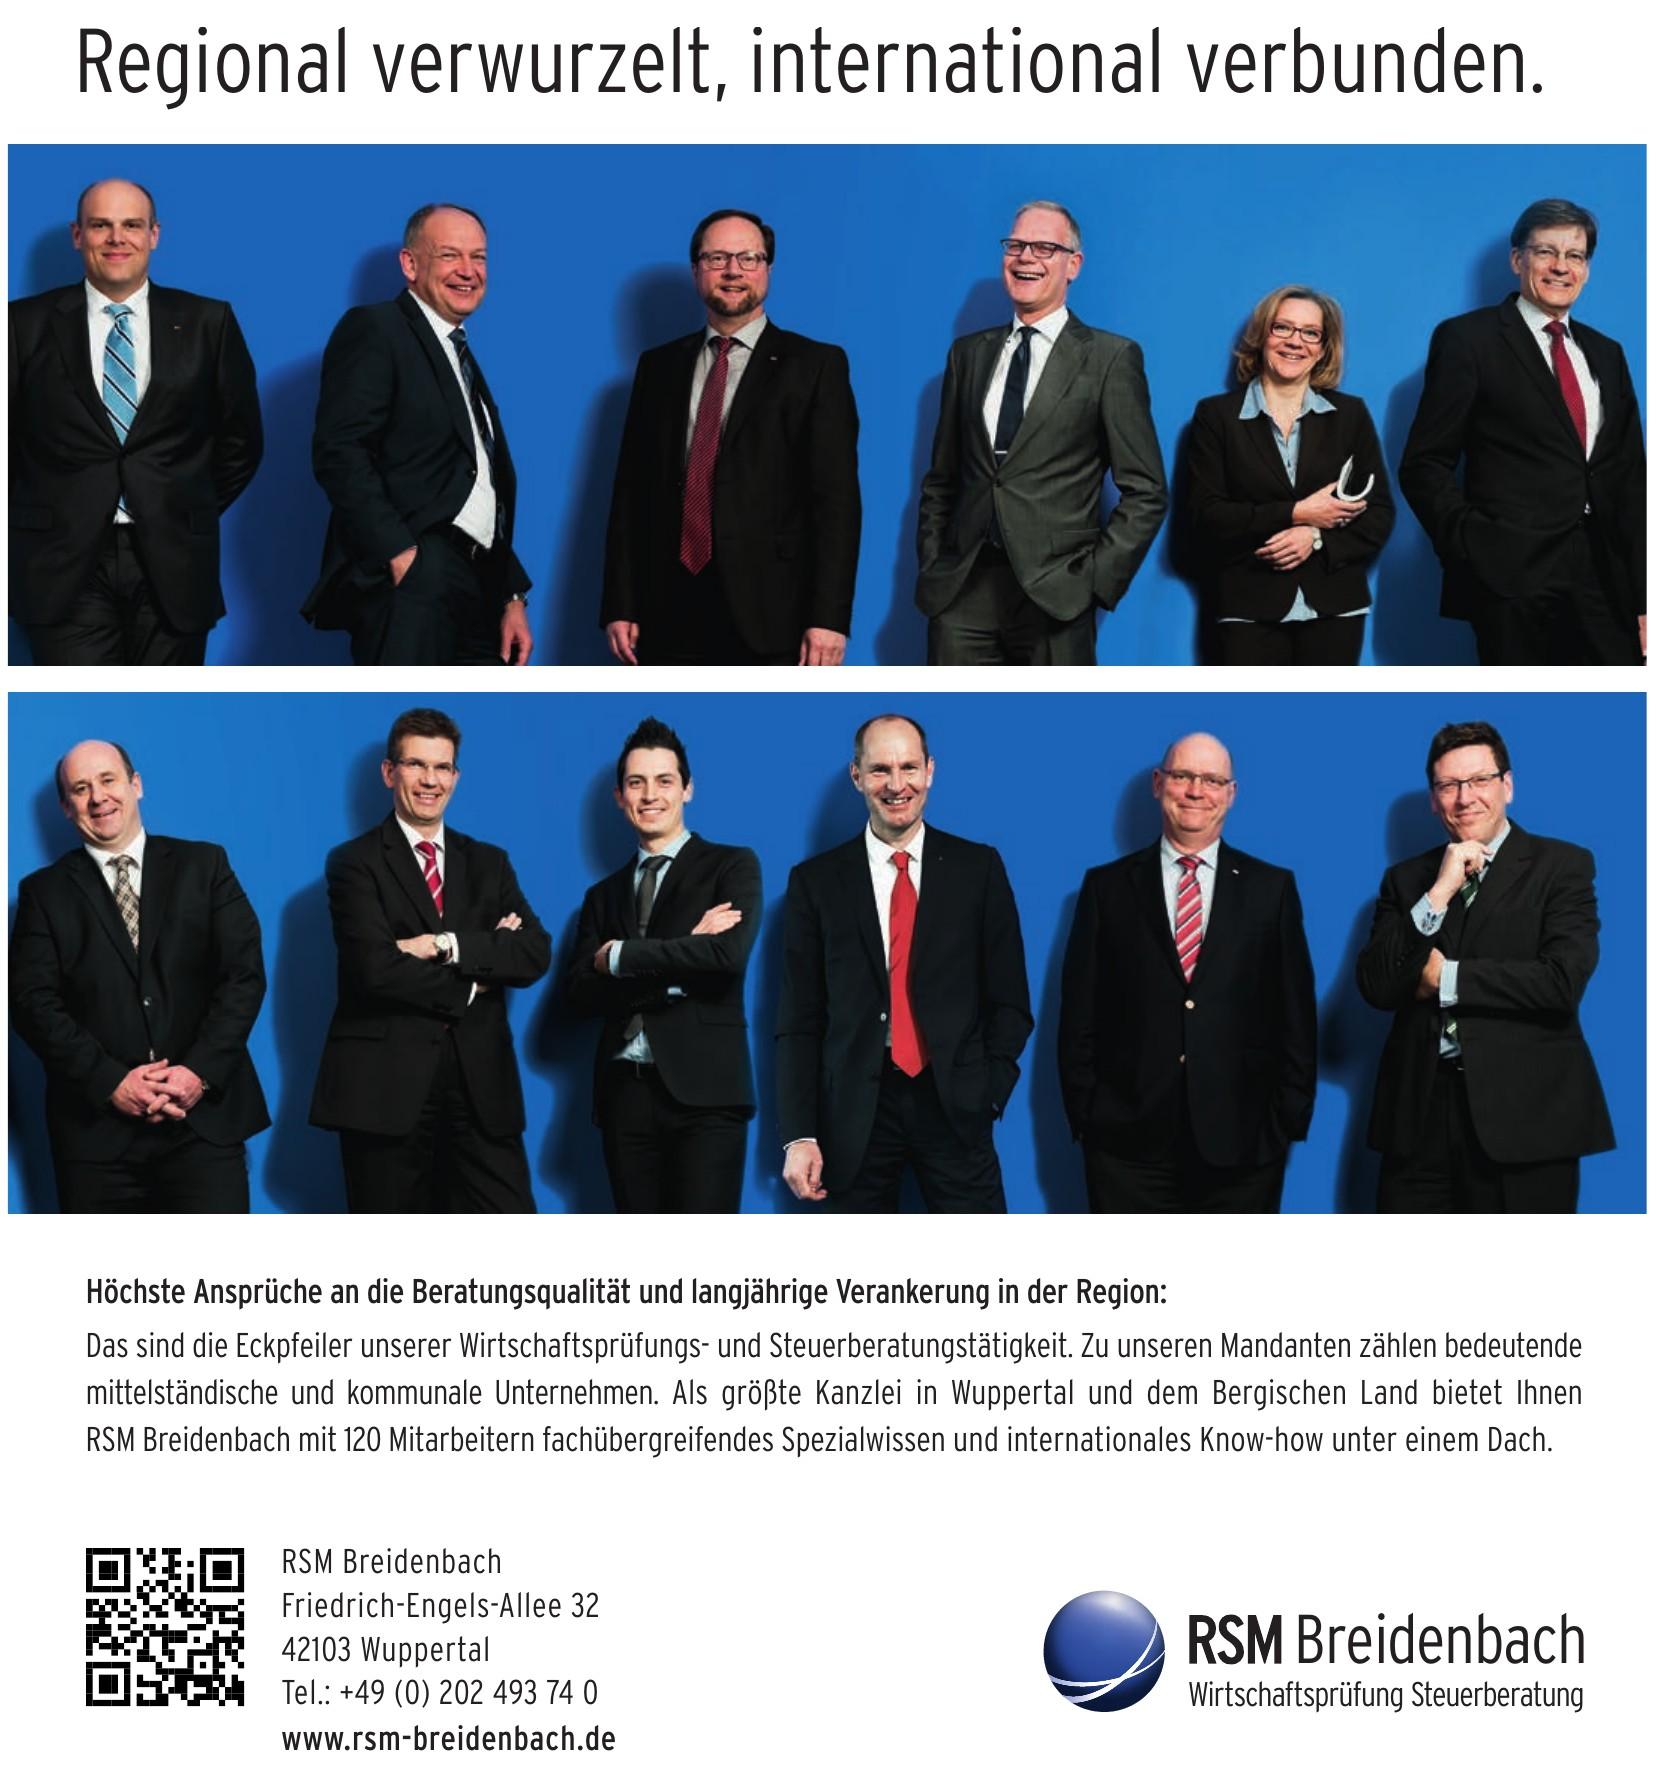 RSM Breidenbach